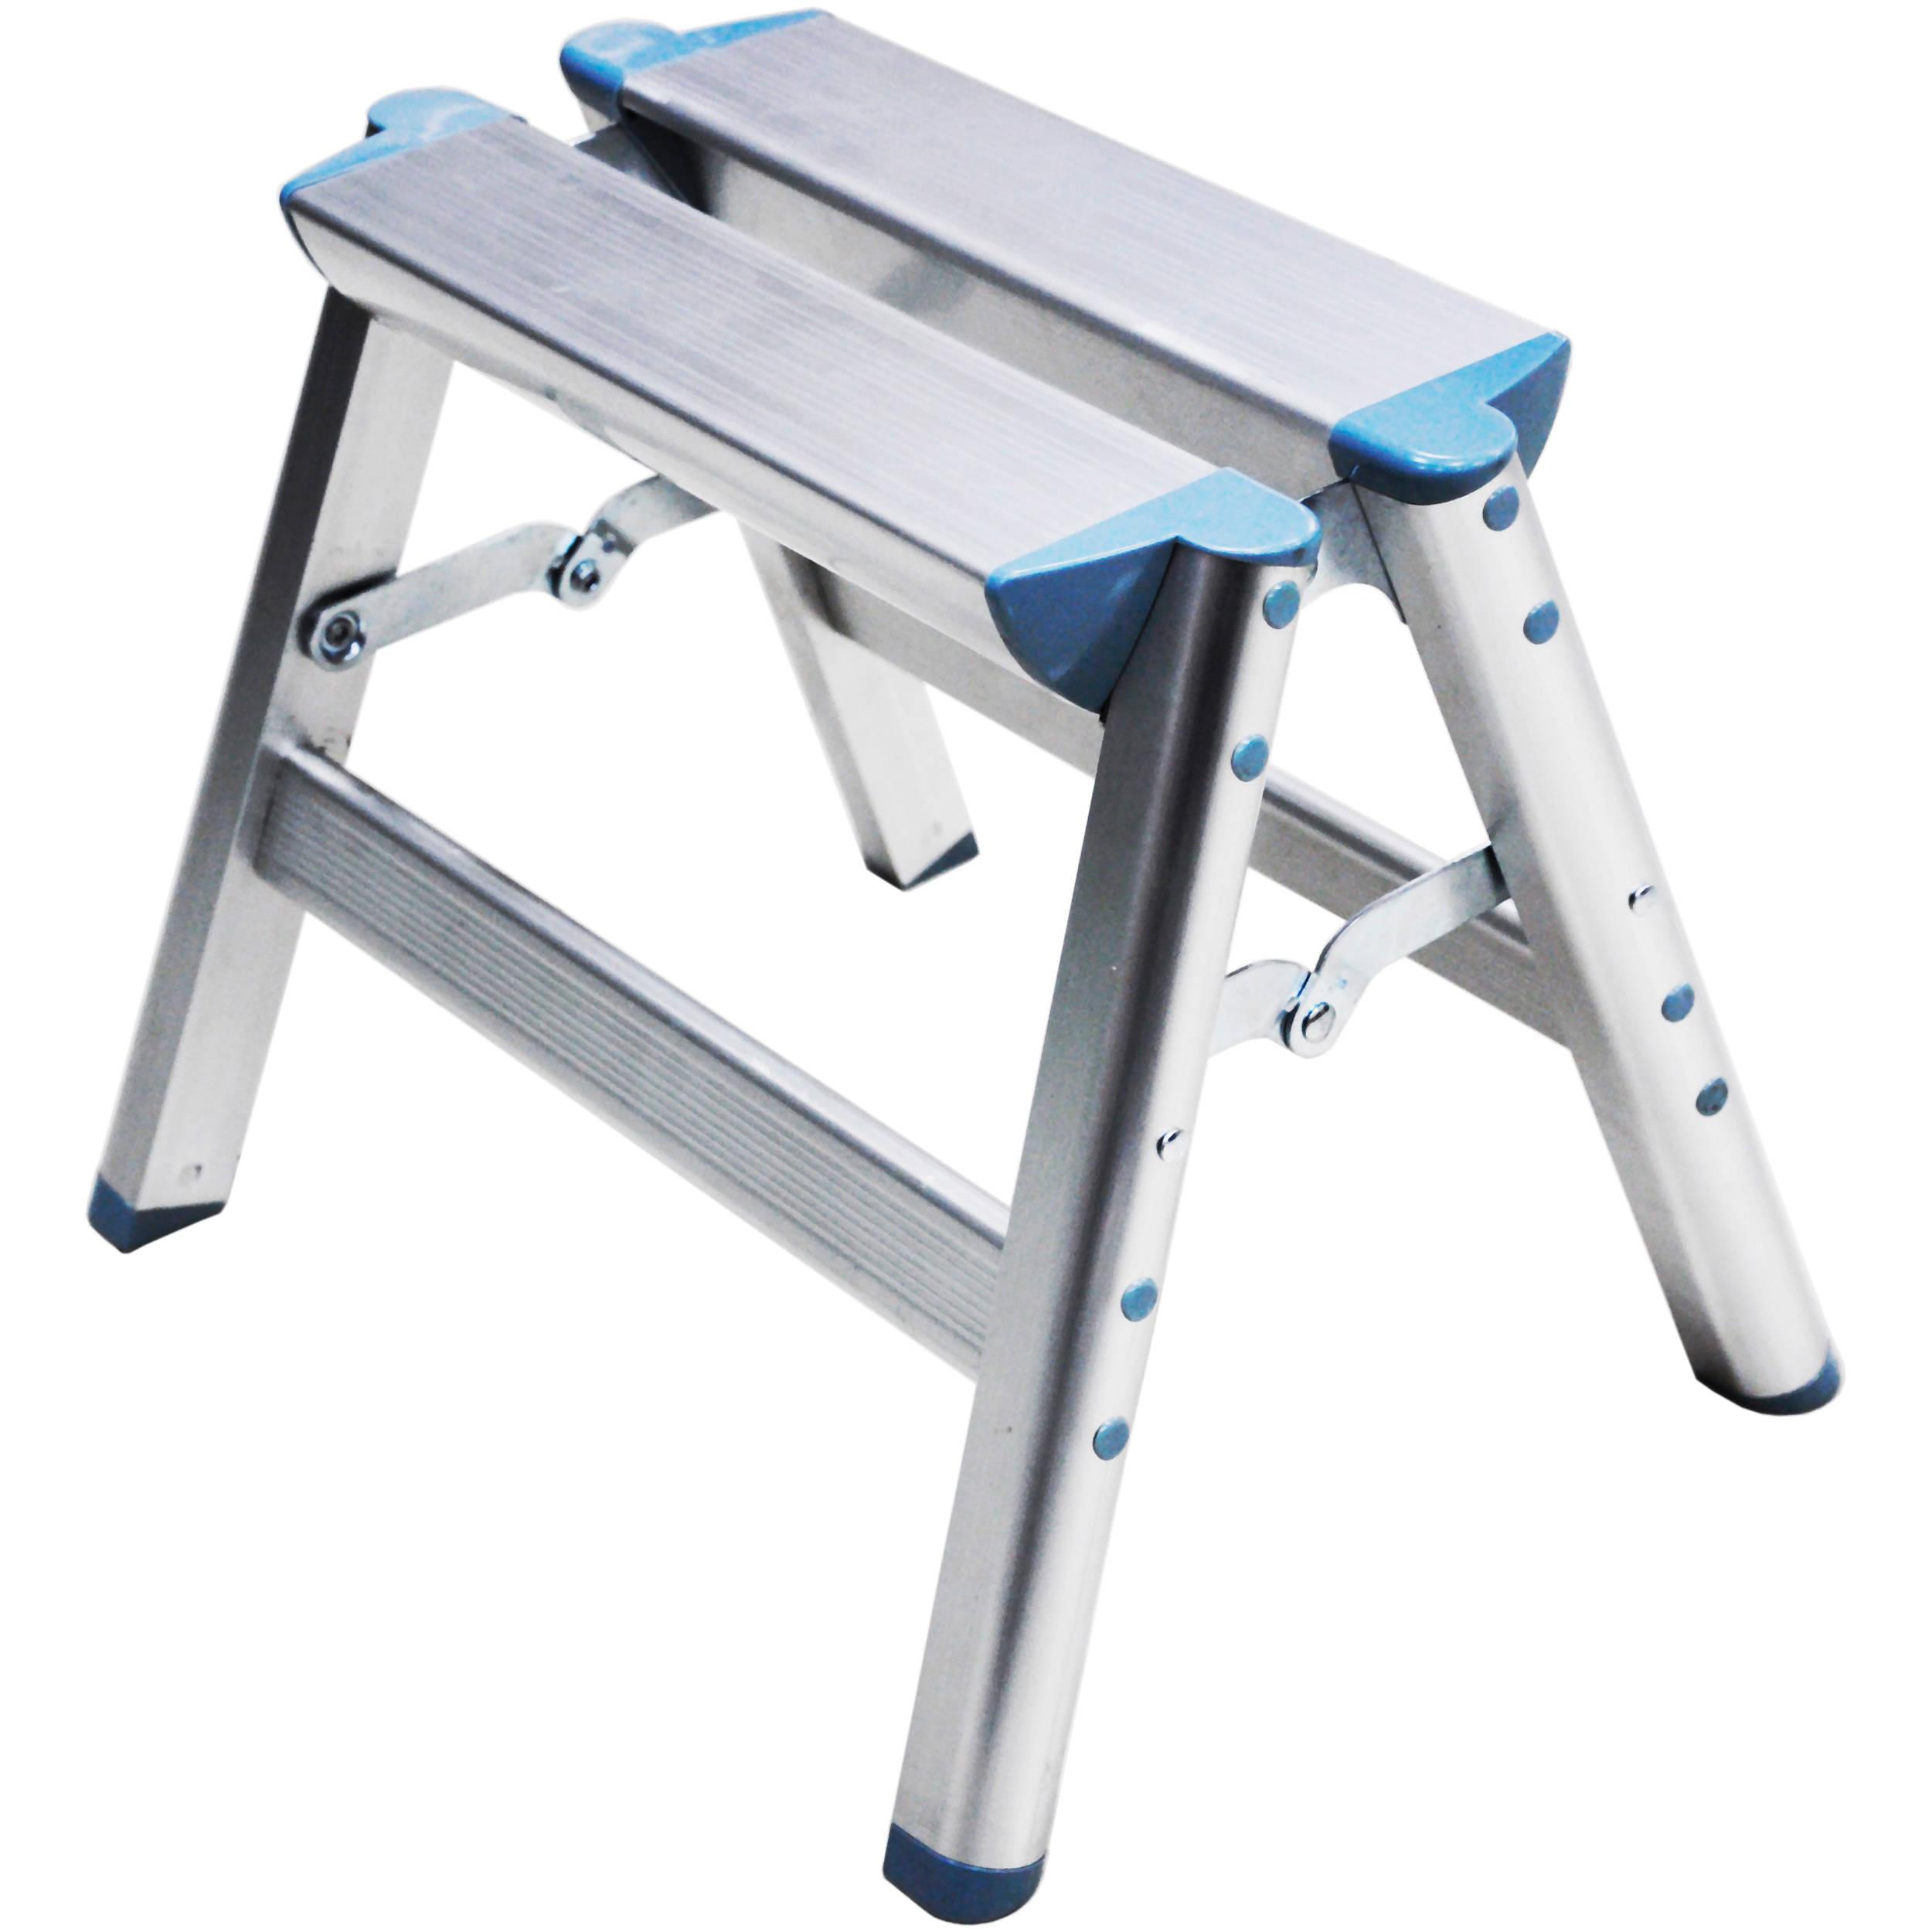 Outstanding Telesteps Folding Aluminum Step Ladder 1 Camellatalisay Diy Chair Ideas Camellatalisaycom